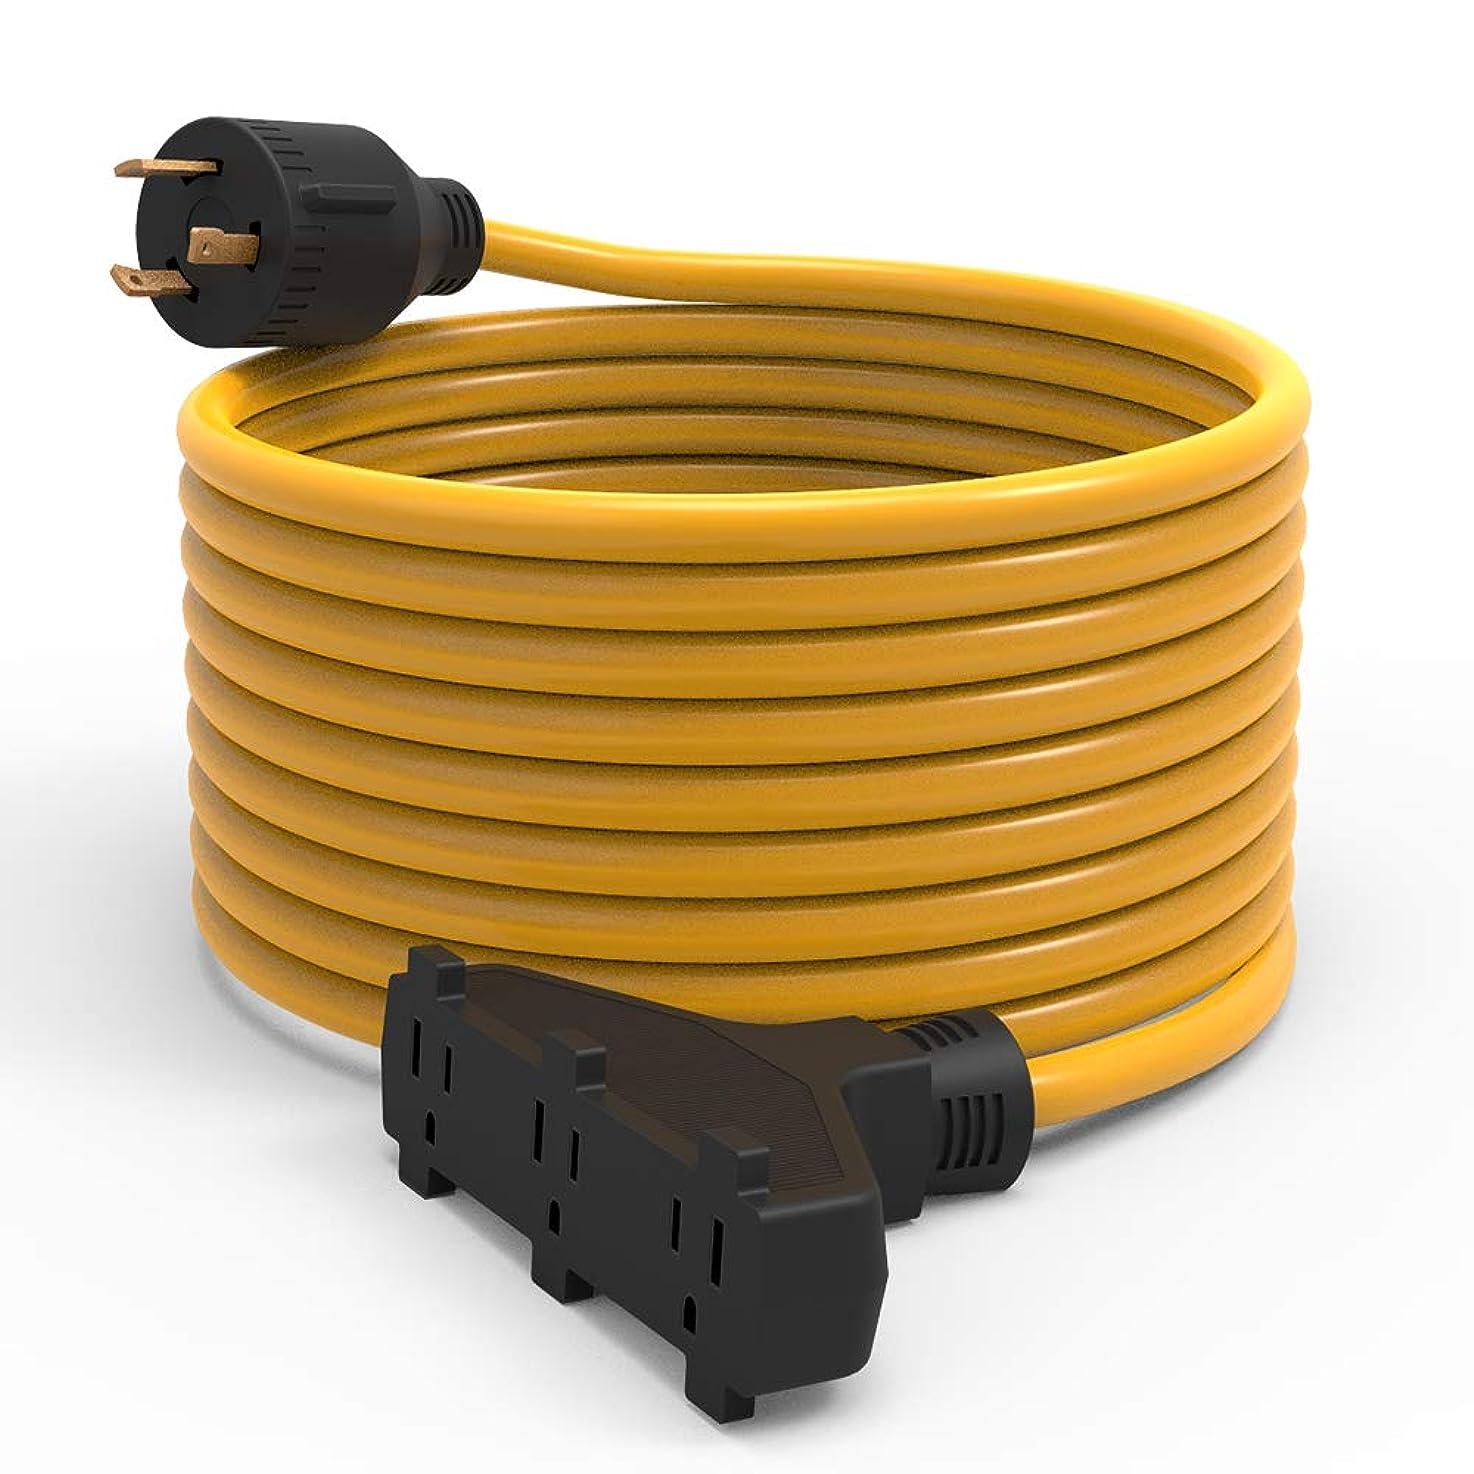 BougeRV Generator Extension Cord 25 Feet 30Amp 125Volt Generator Power 3750 Watts Extension Cord (Nema L5-30P to three 5-15R)